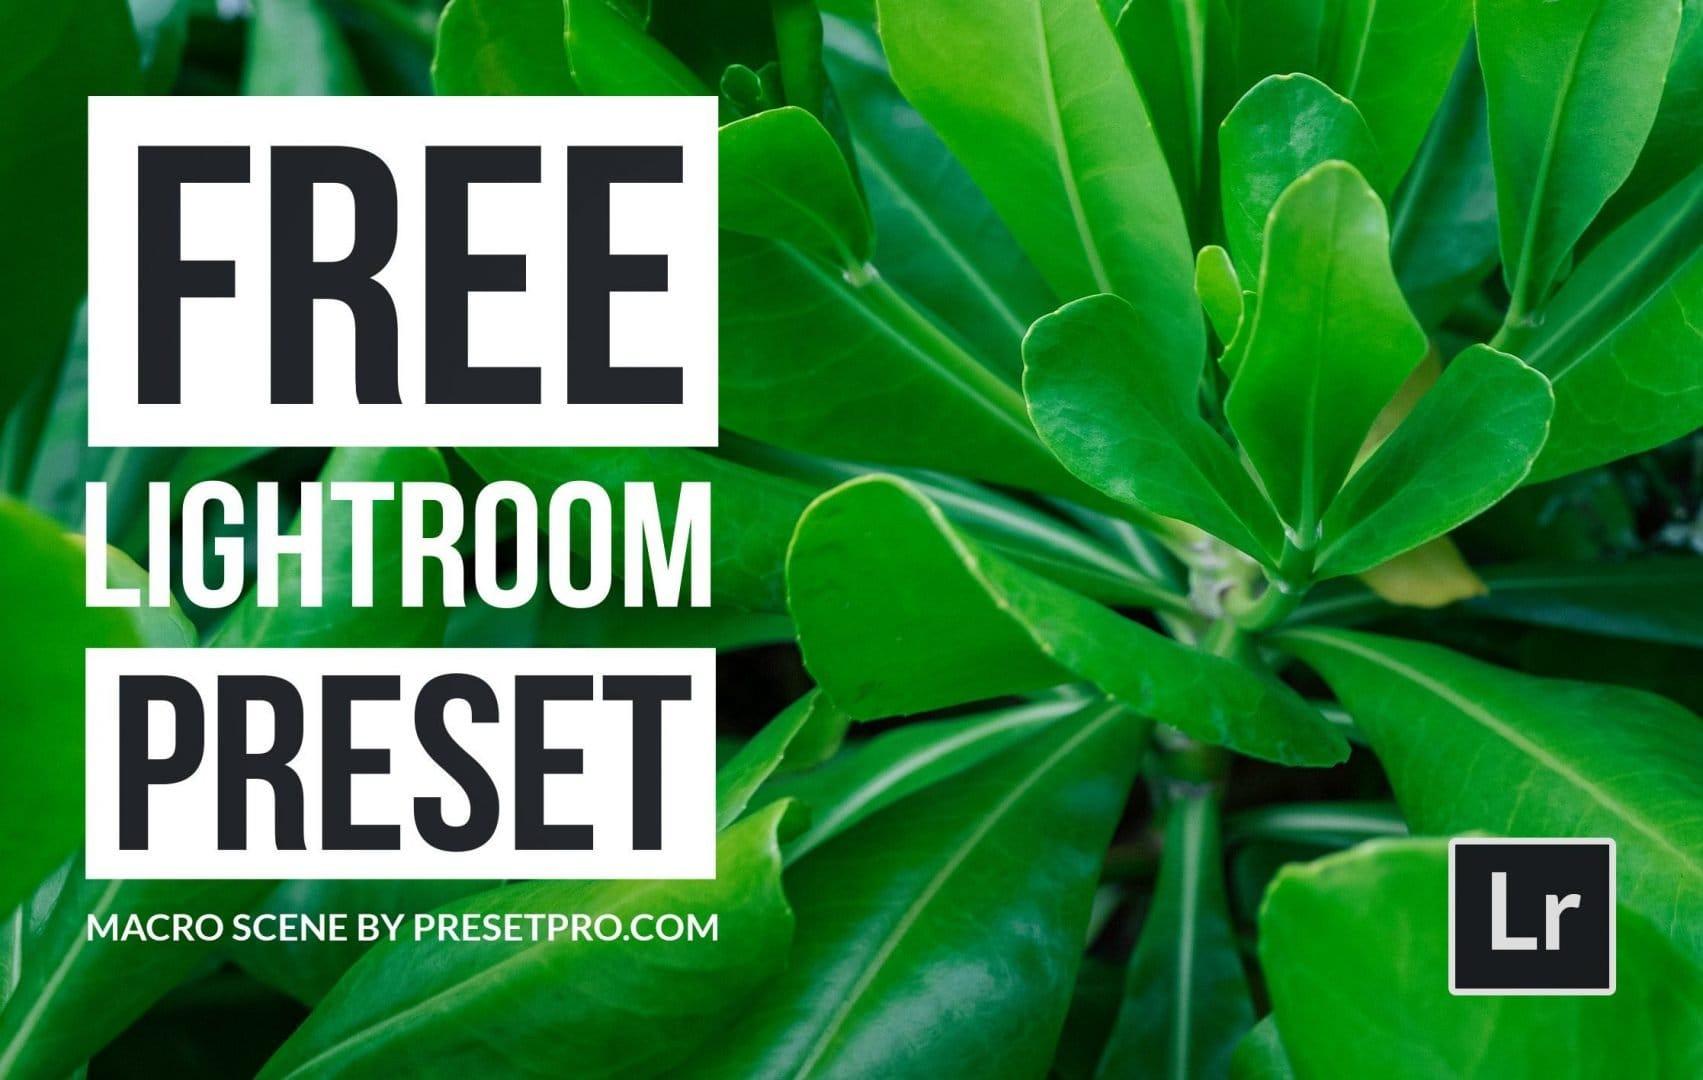 Free-Lightroom-Preset-Macro-Scene-Cover-Presetpro.com